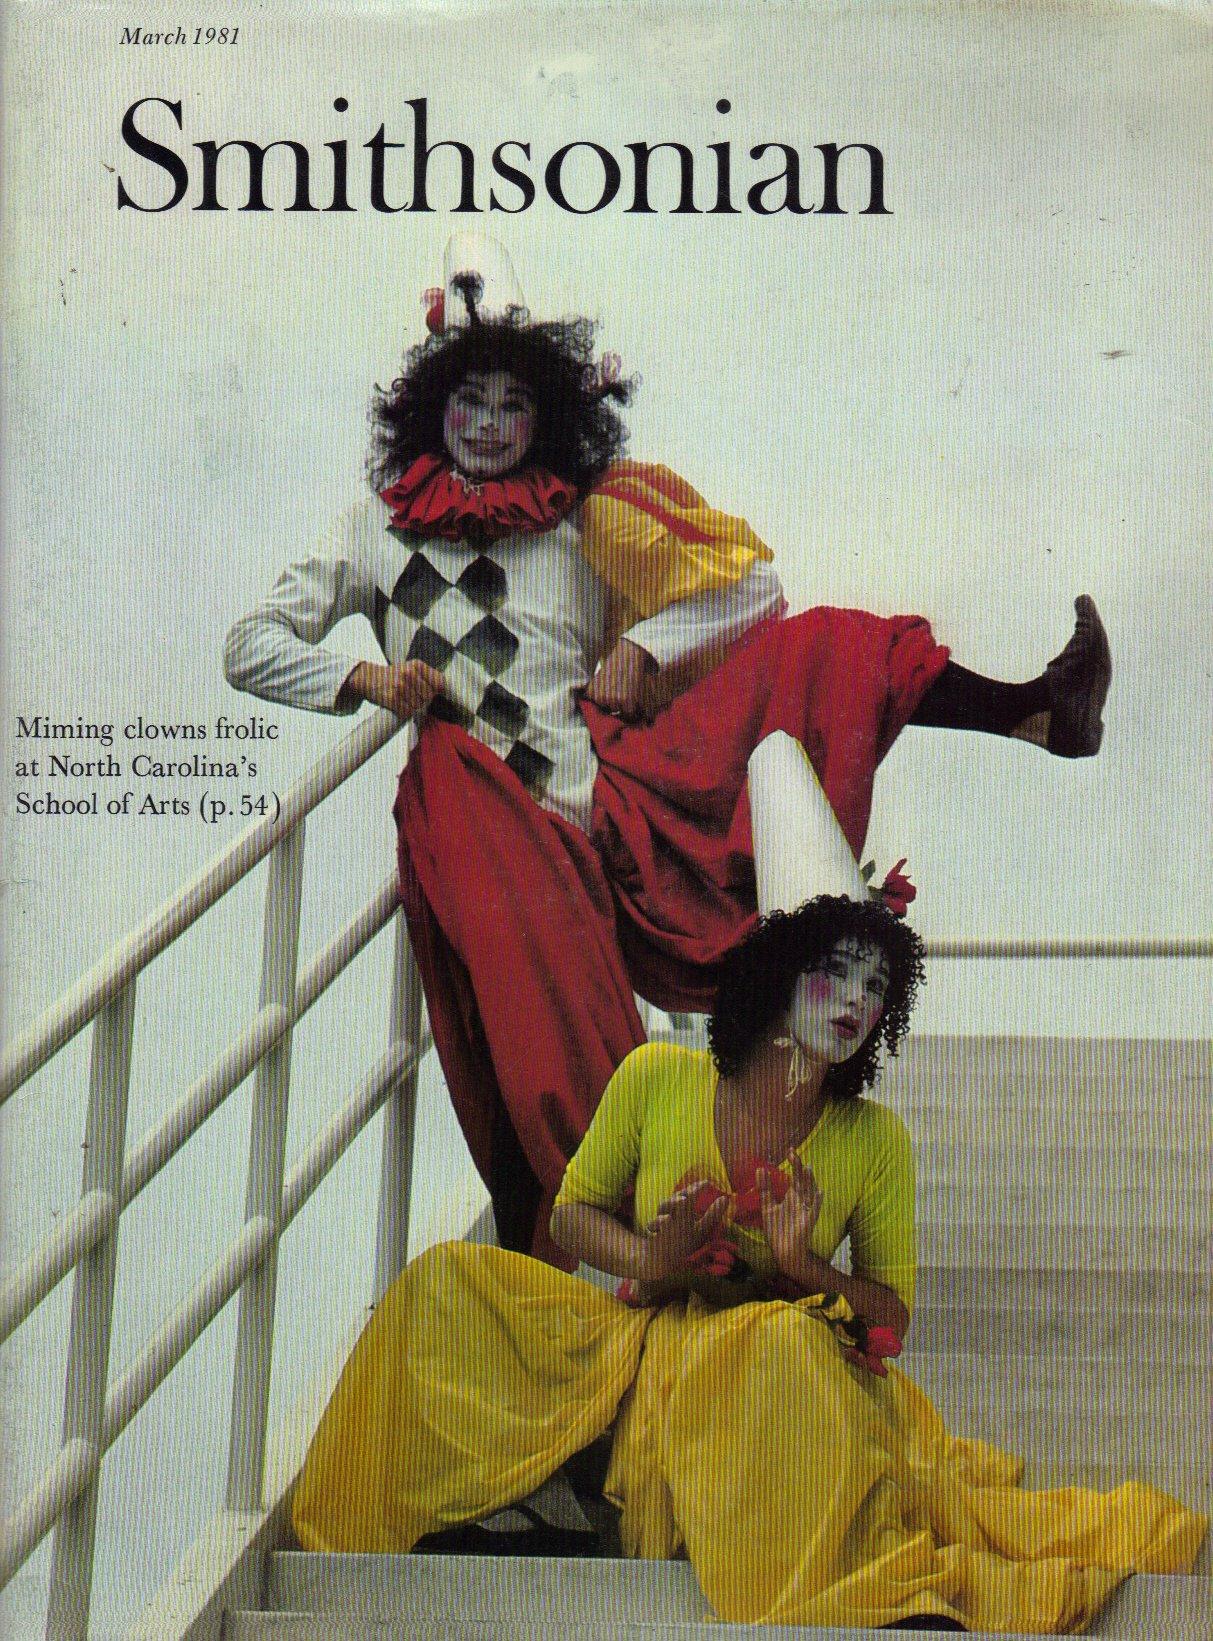 Smithsonian Magazine, March 1981 (Vol. 11 No. 12)